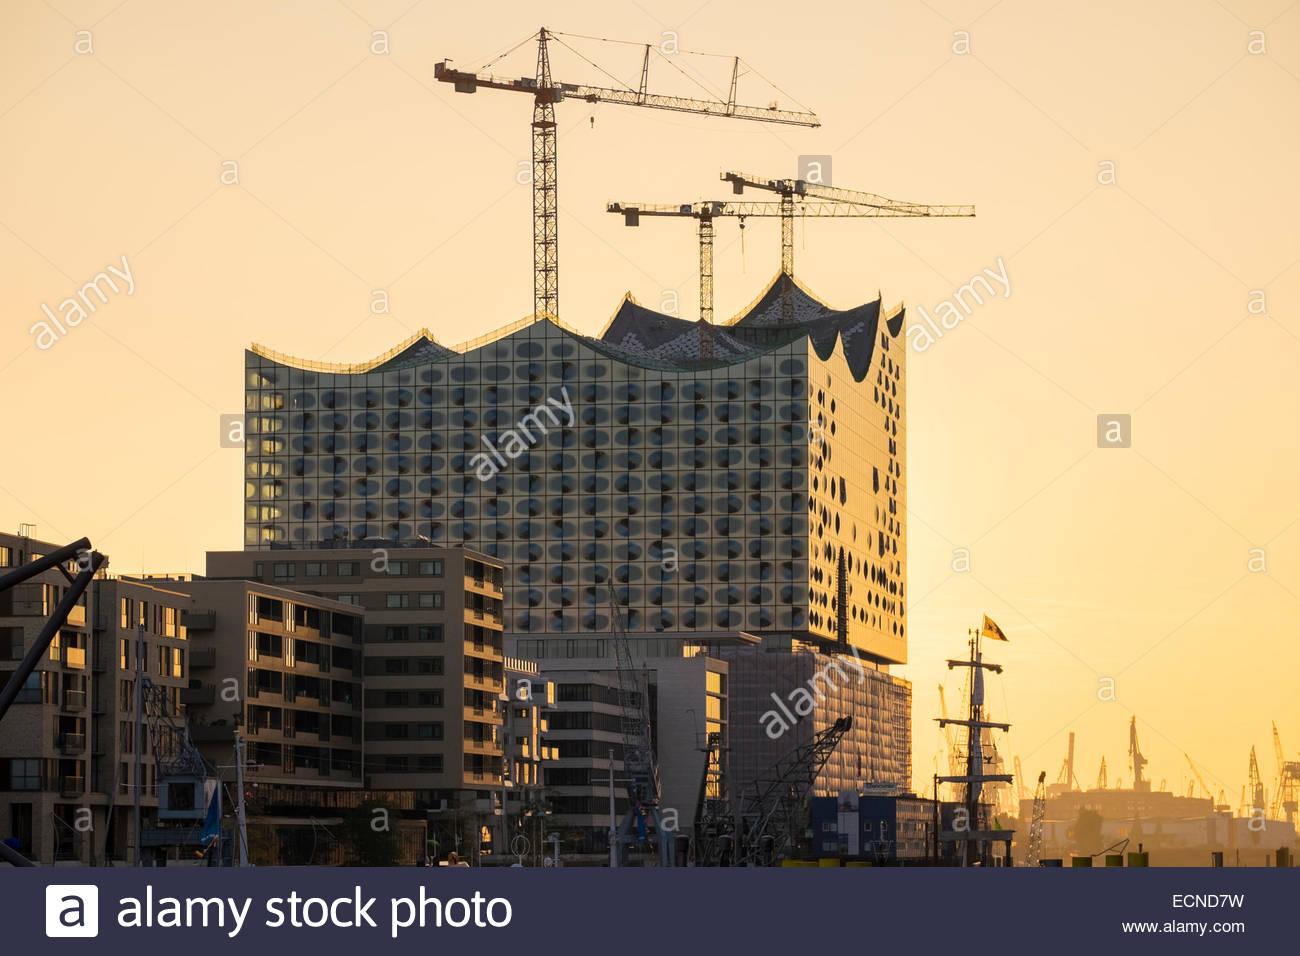 Under-construction Elbphilharmonie (Elbe Philharmonic Hall) and buildings on Kaiserkai at sunset, HafenCity, Hamburg, - Stock Image